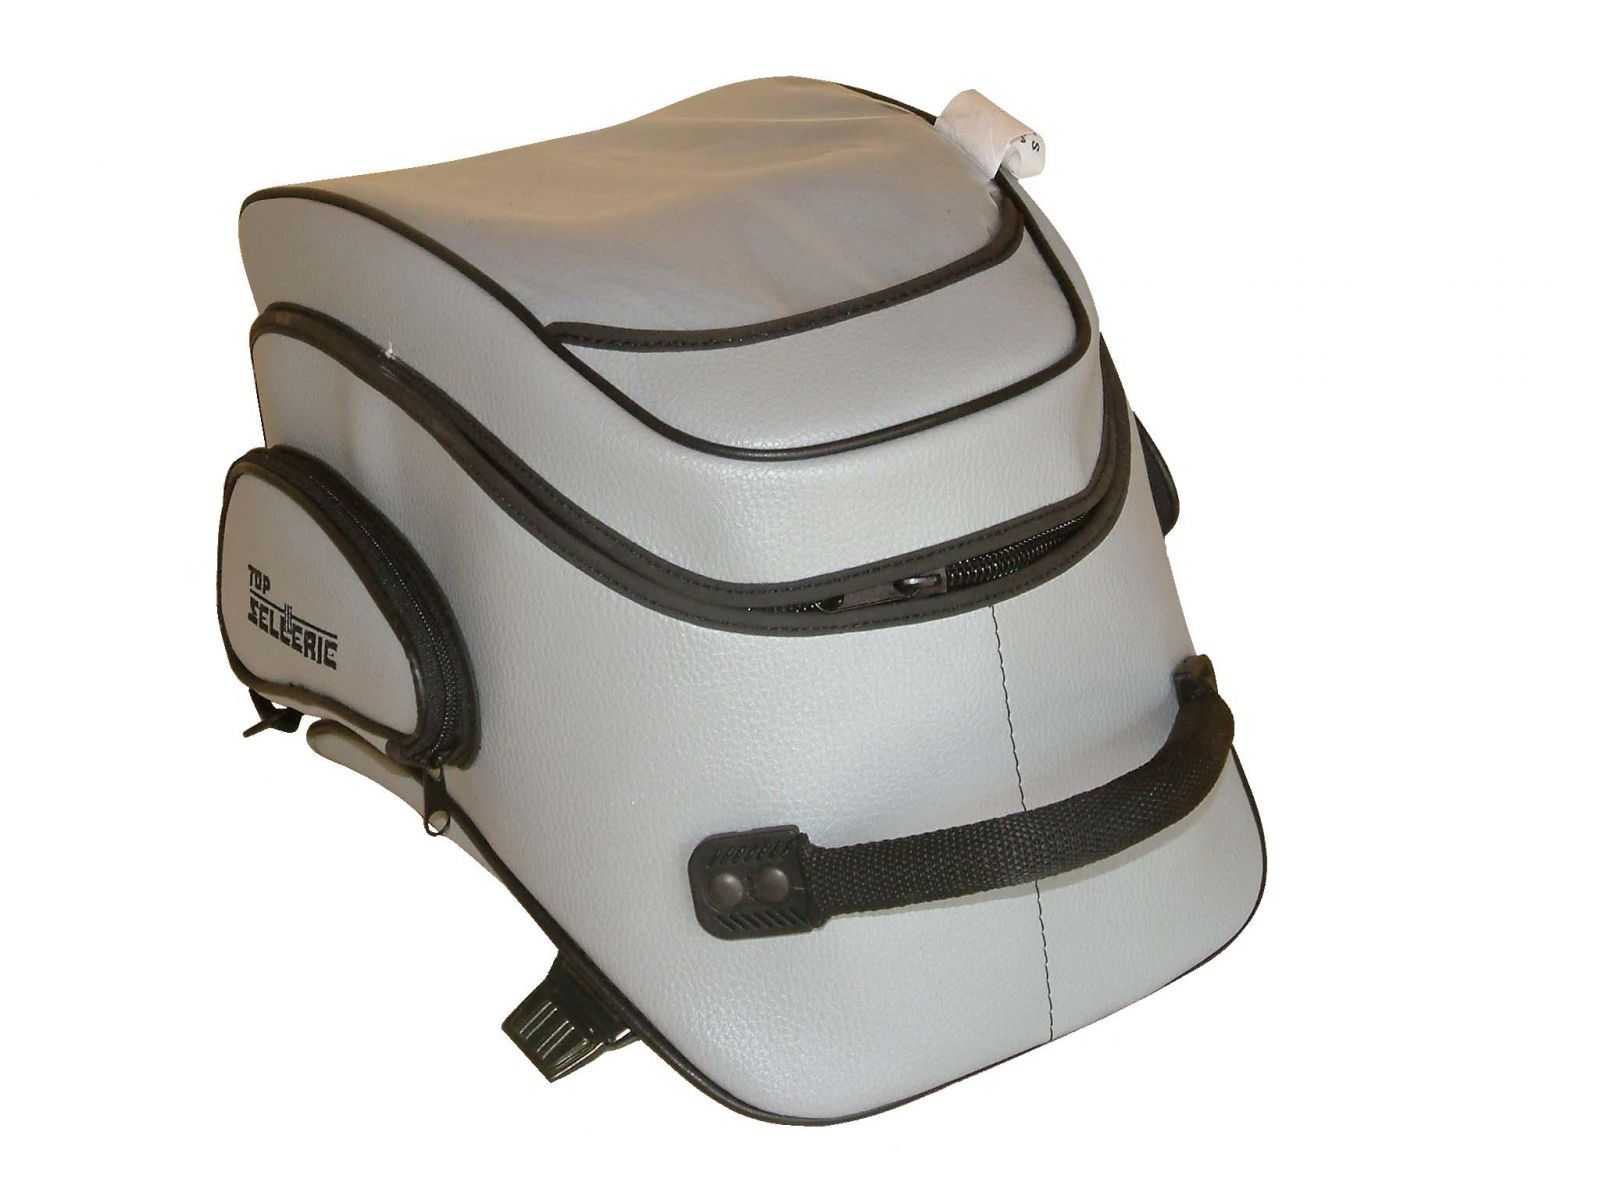 Tank bag <strong>ARIZONA</strong> SAC2853